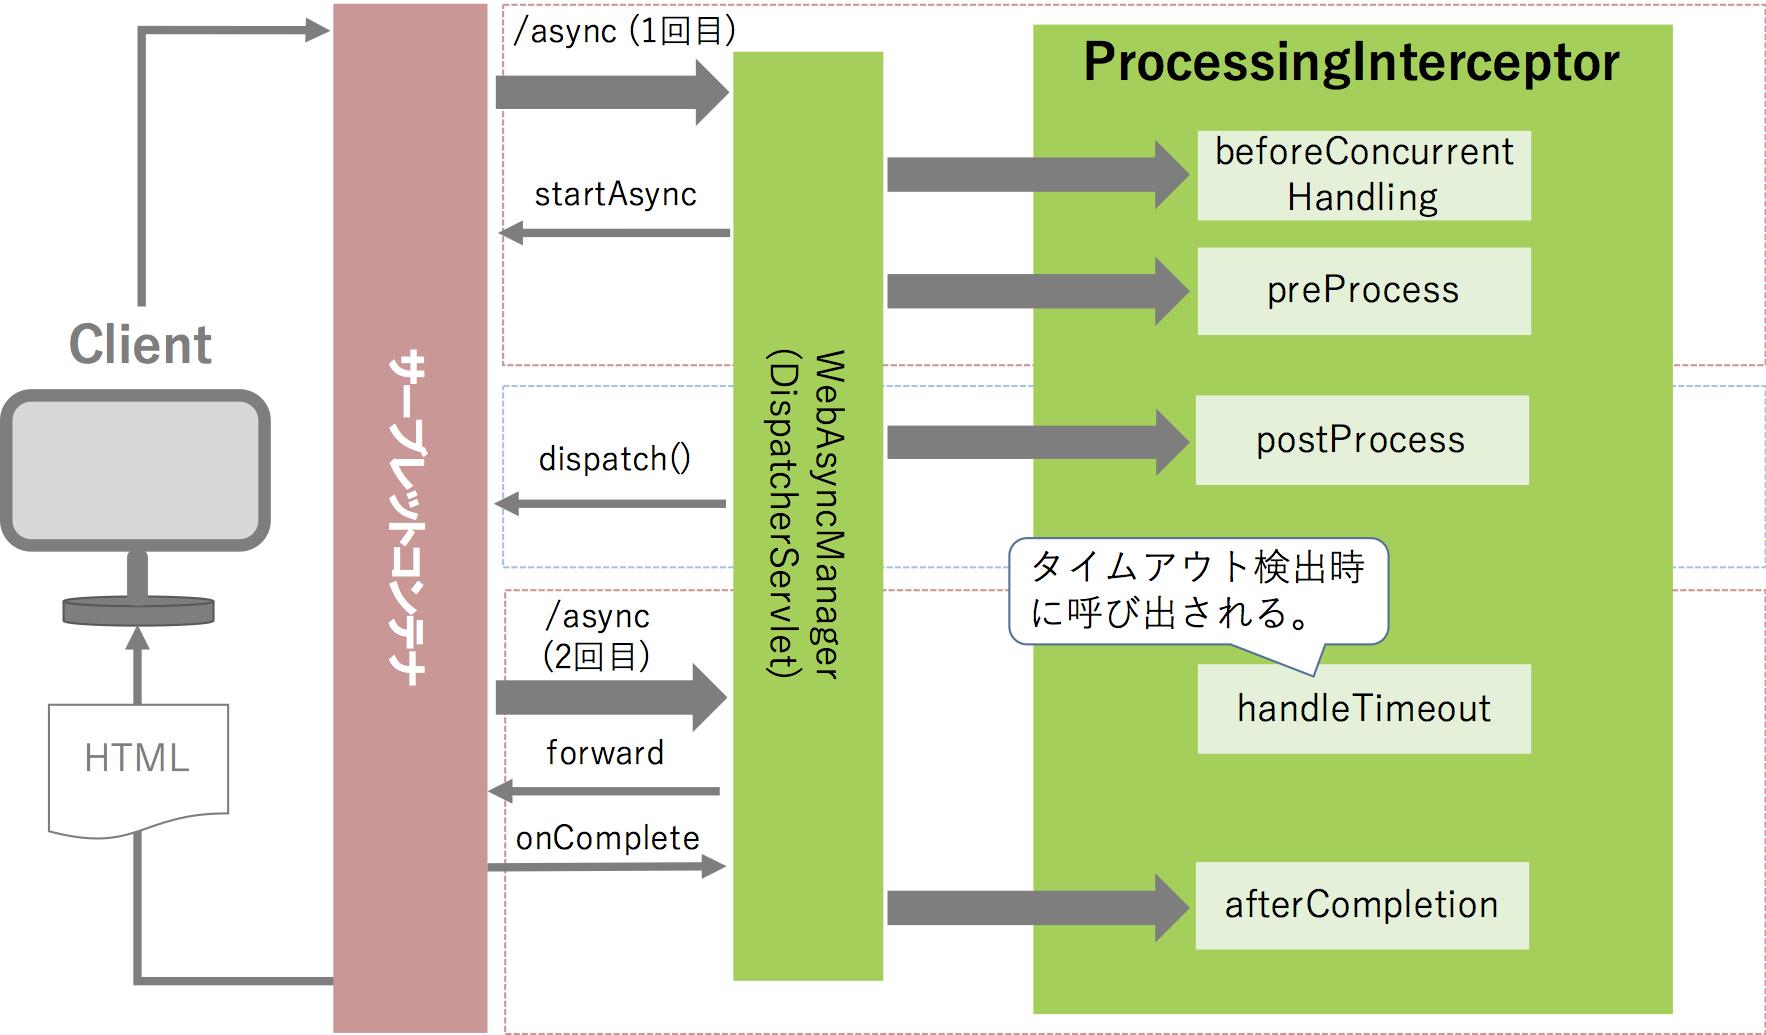 spring-mvc-async-processing-interceptor.png